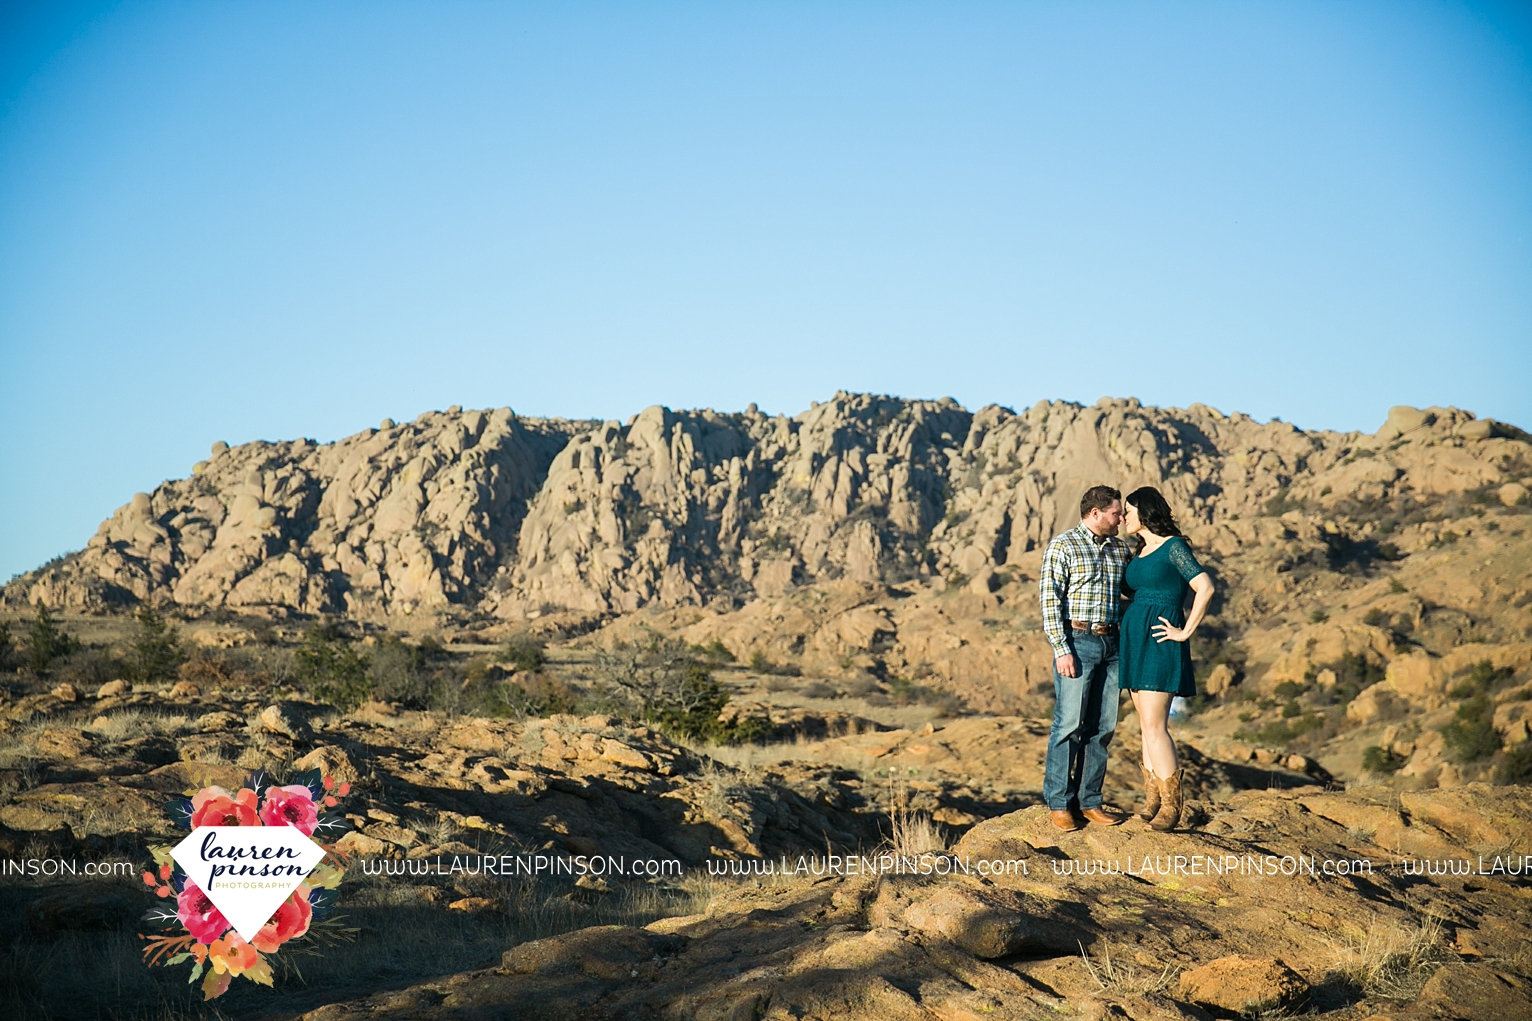 wichita-falls-texas-engagement-photographer-wedding-oklahoma-lawton-wichita-mountains-refuge-outdoors-mountains-engaged_2062.jpg